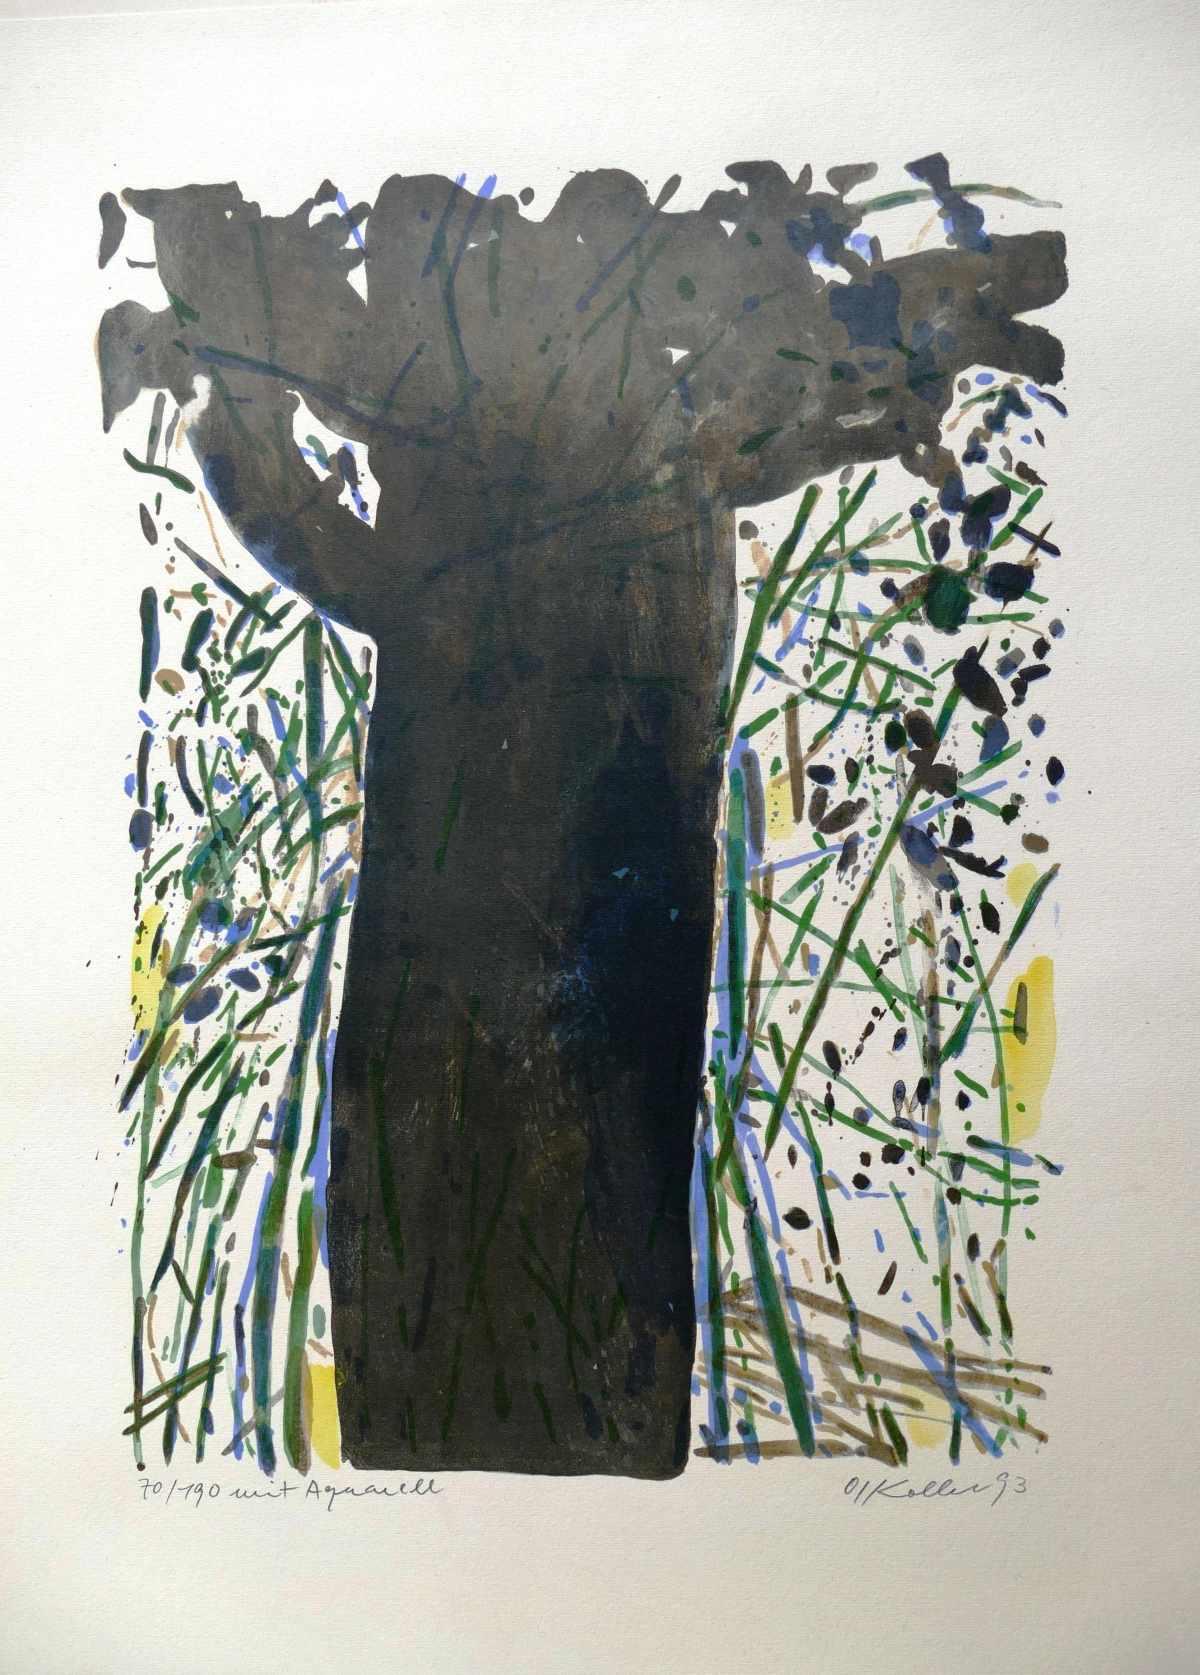 Oskar Koller - Baum im Farbenmeer, Farblithographie mit Aquarell kopen? Bied vanaf 180!